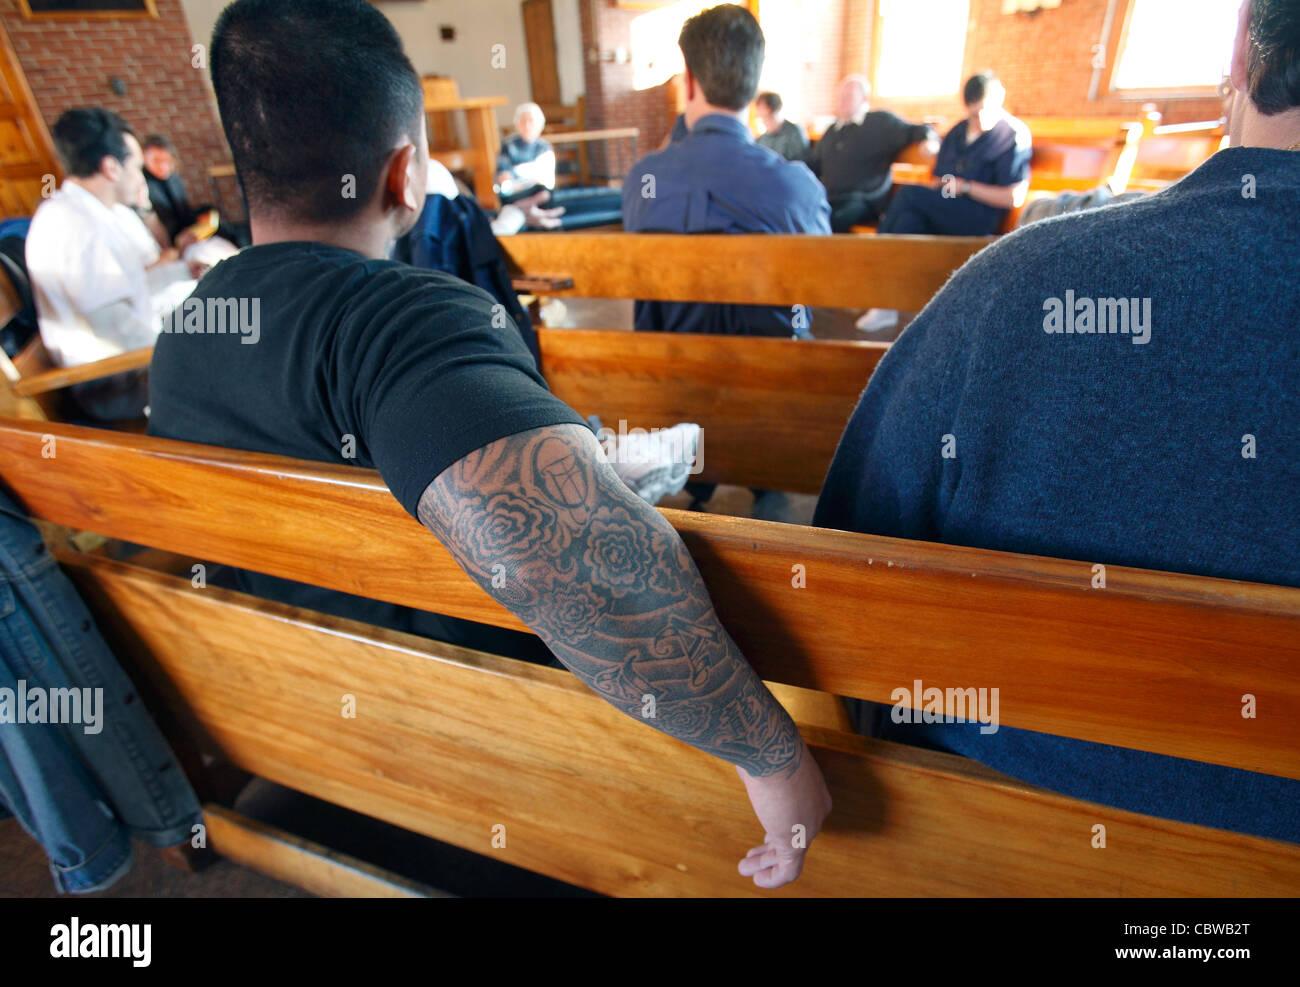 Dominican lay program for prisoners at the medium security Massachusetts Correctional Institute, Norfolk, Massachusetts - Stock Image